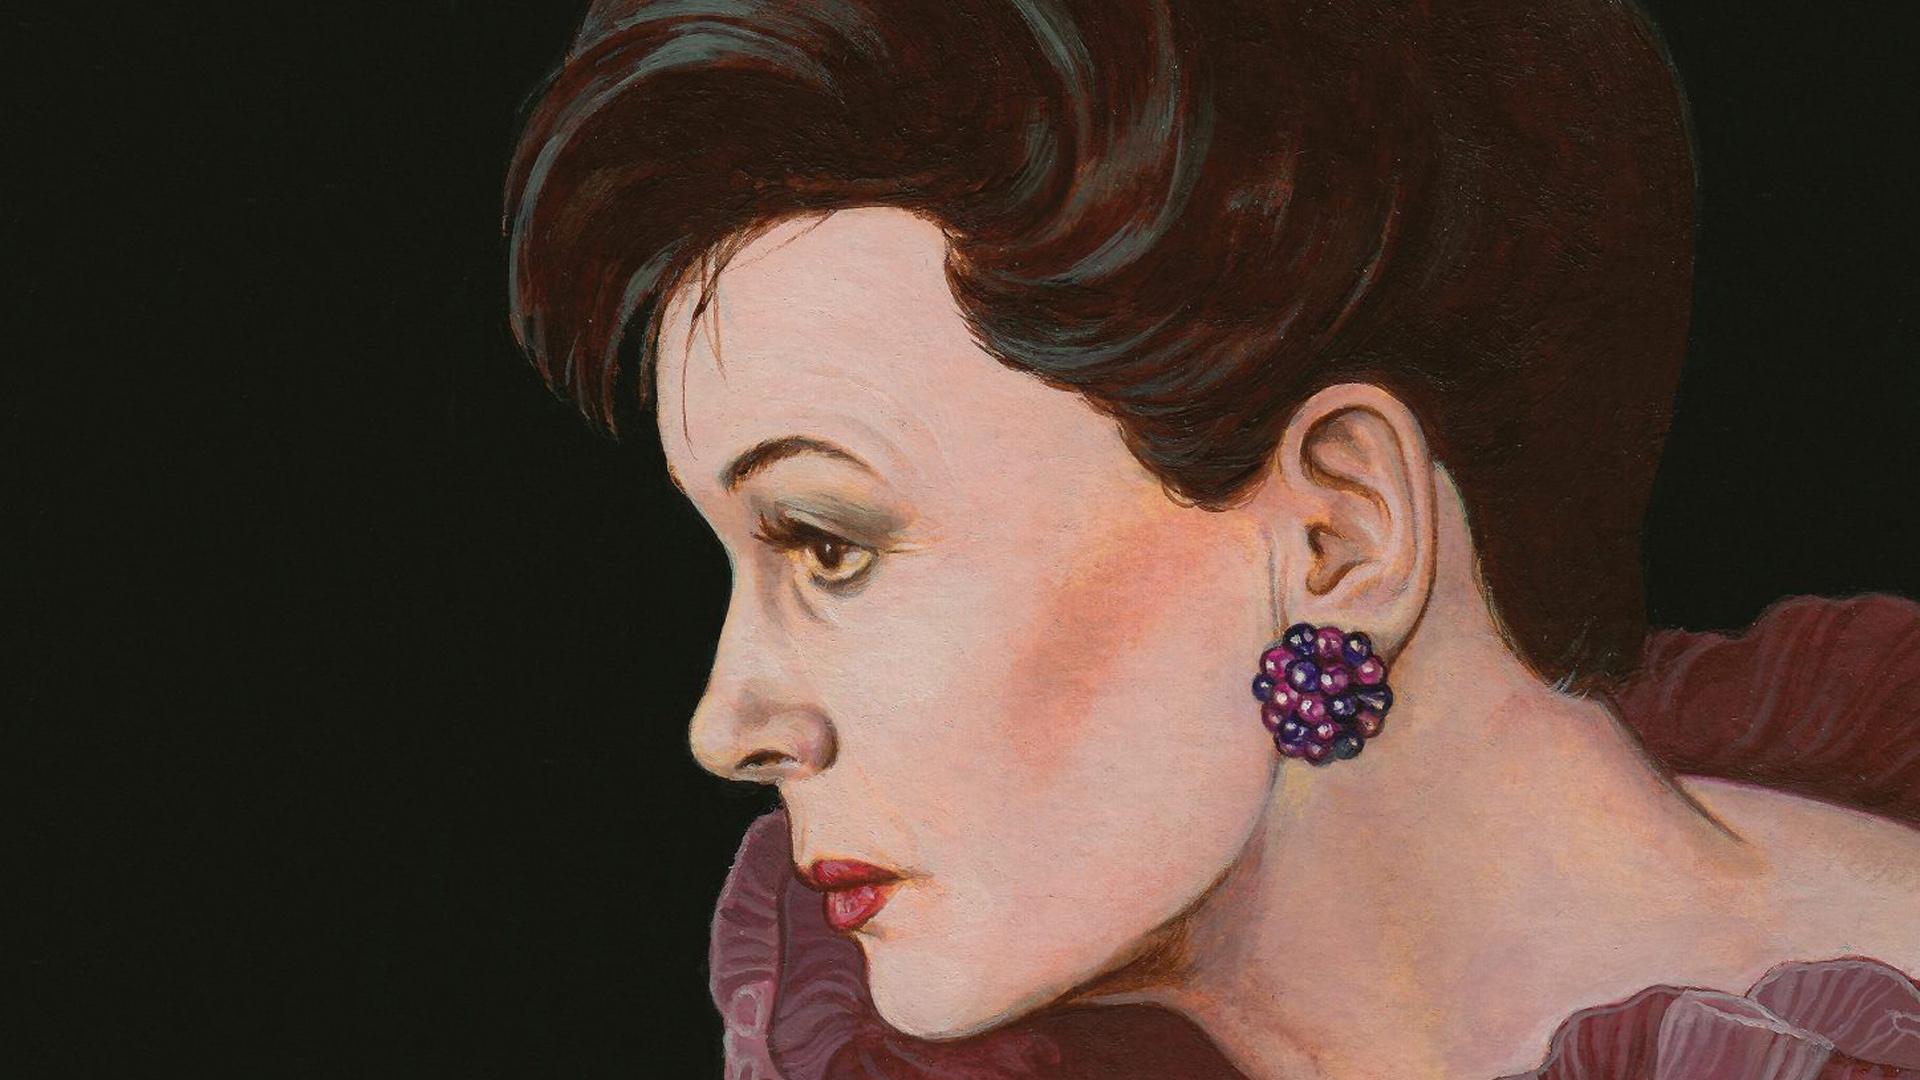 Judy movie artwork Pierre Mornet